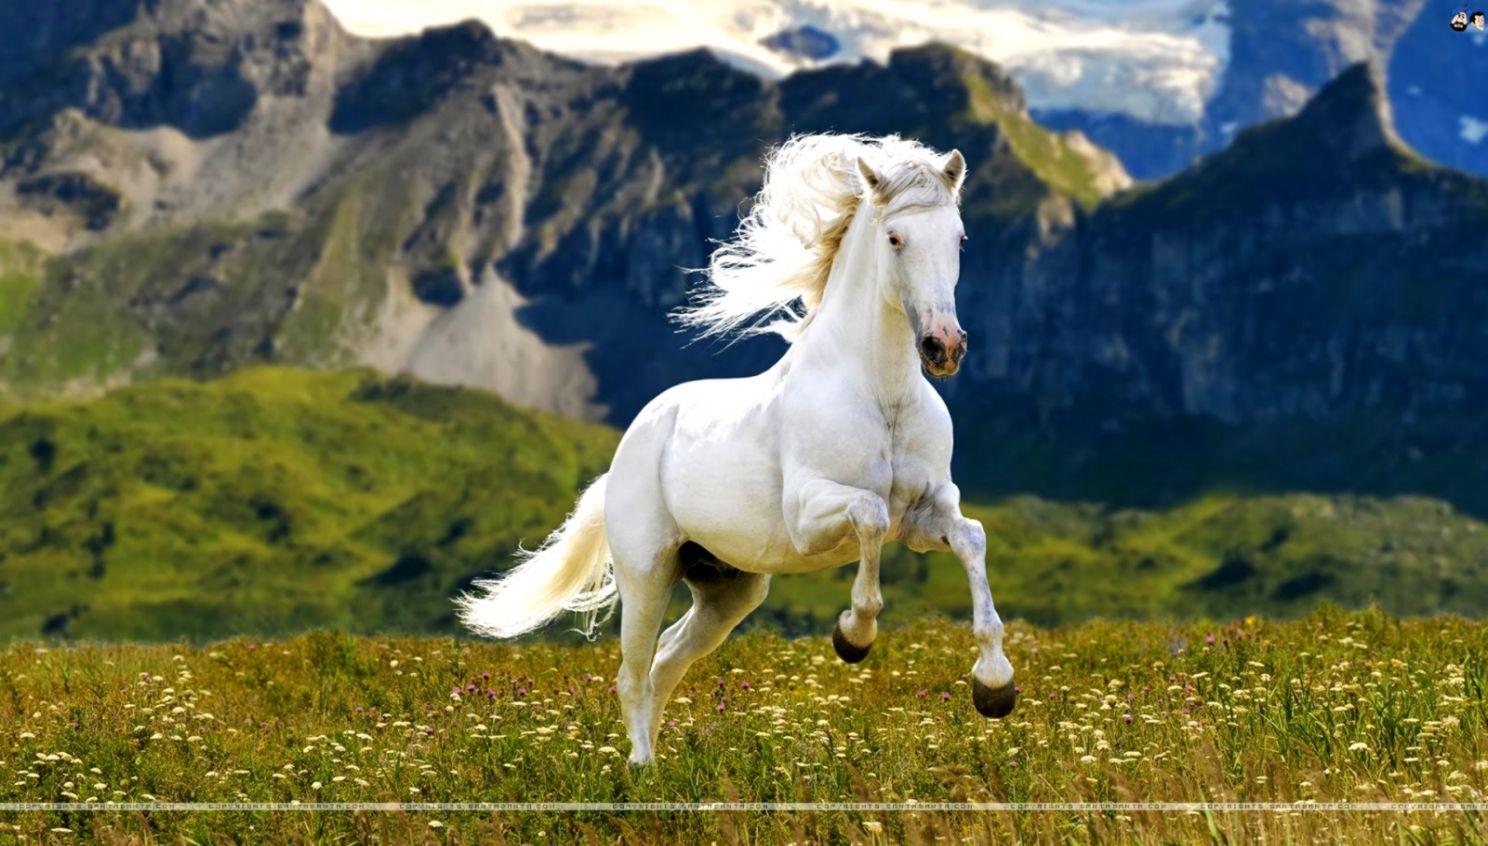 White Running Horse Wallpaper Amazing Wallpaper Hd Library